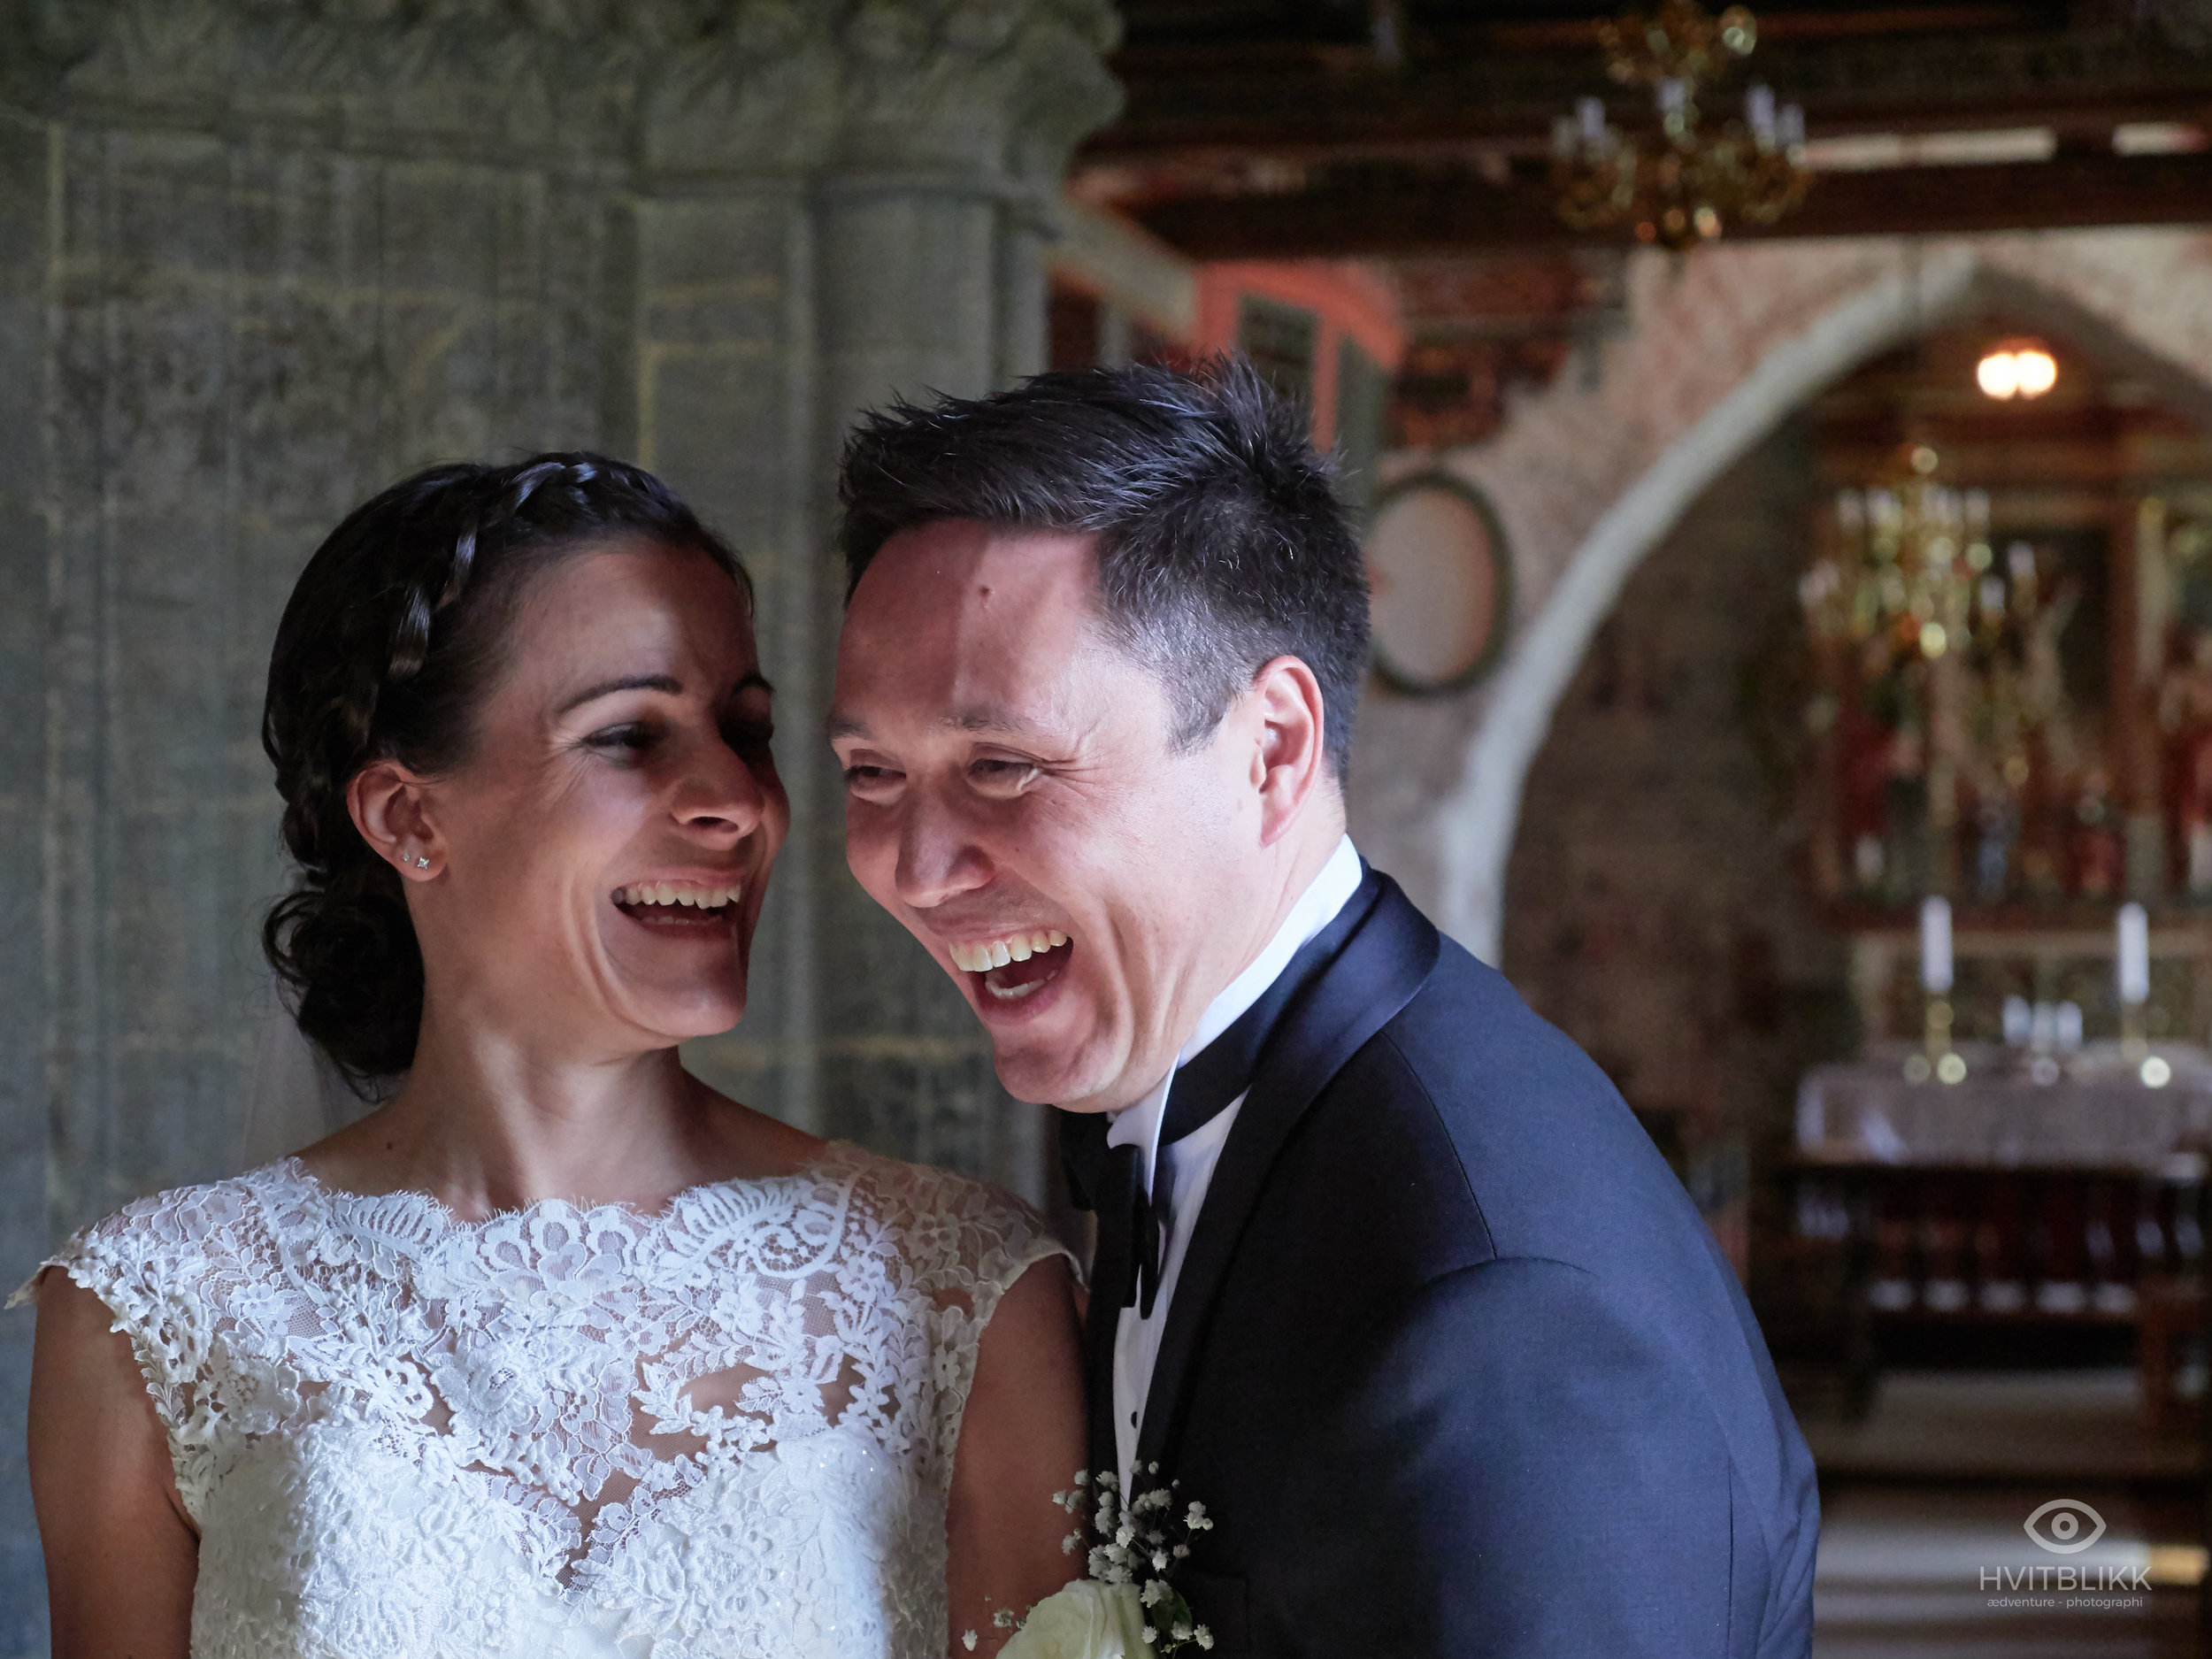 BryllupTonjeogJoHelgemai 23 2018 146.jpg